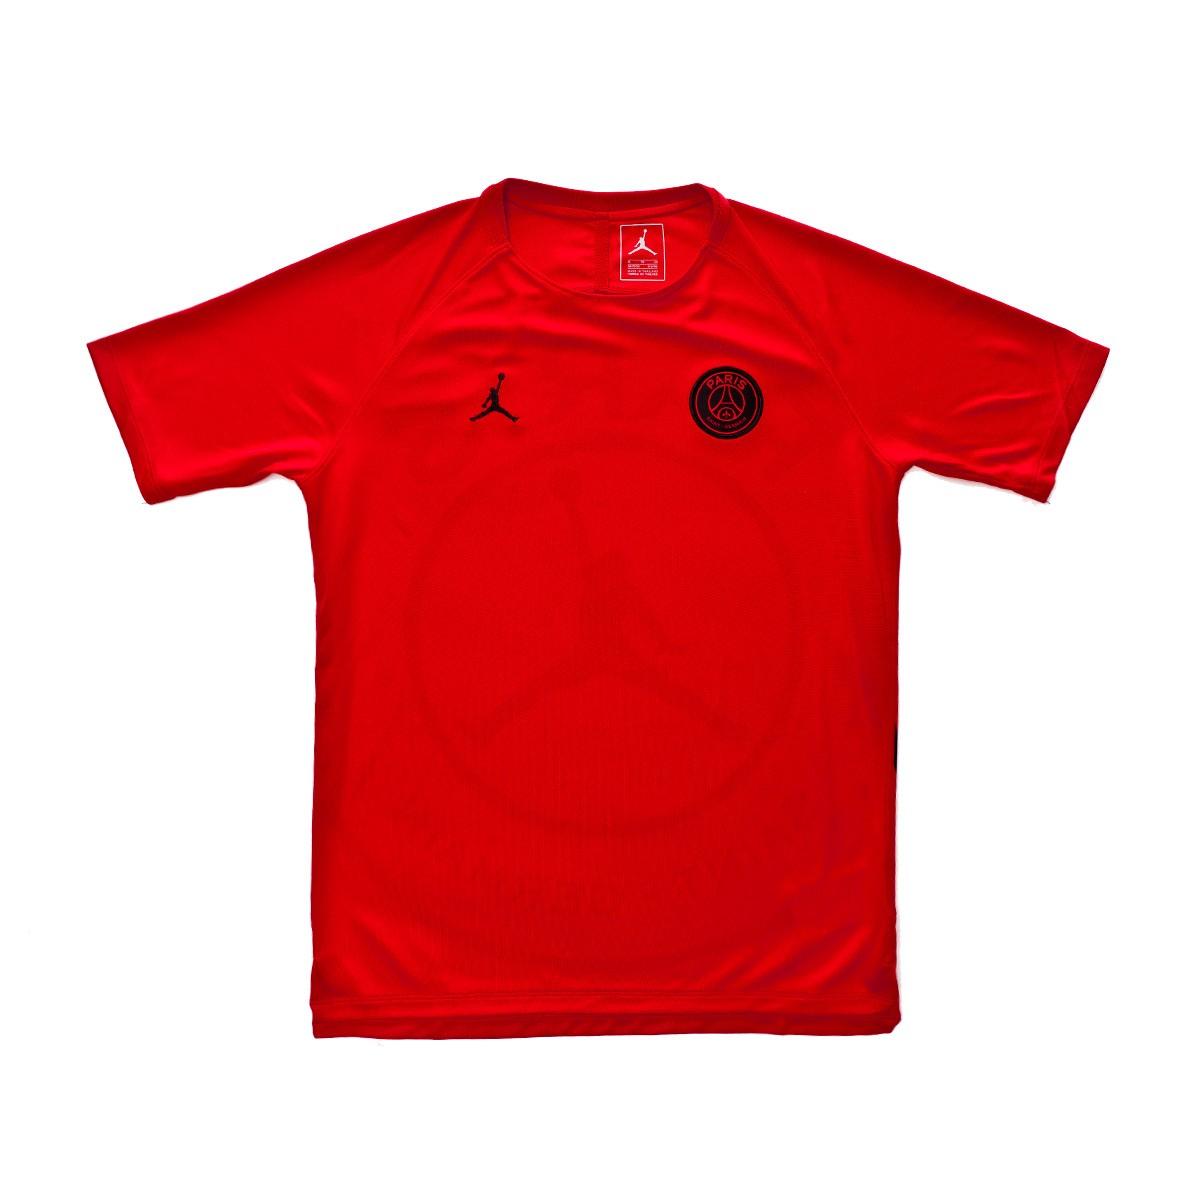 1e1ec3ed Jersey Nike Paris Saint-Germain Dry Squad SS GX CL 2018-2019 Niño  University red-Black - Football store Fútbol Emotion